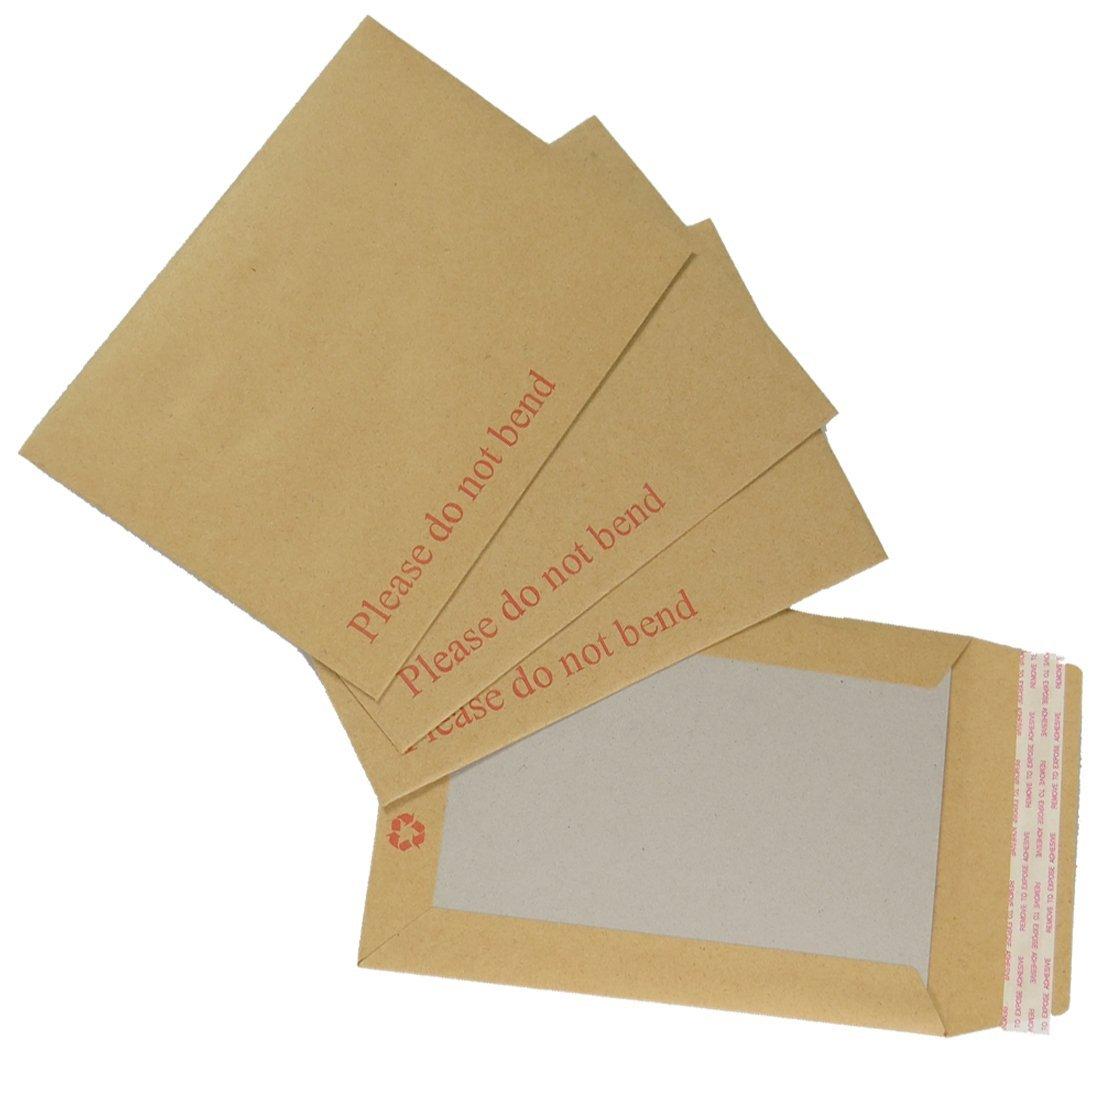 Triplast 229 x x x 162 mm A5 C5 Manilla Hard Board Briefumschläge (500 Stück) B01H01UDWQ | Verkauf  46e857